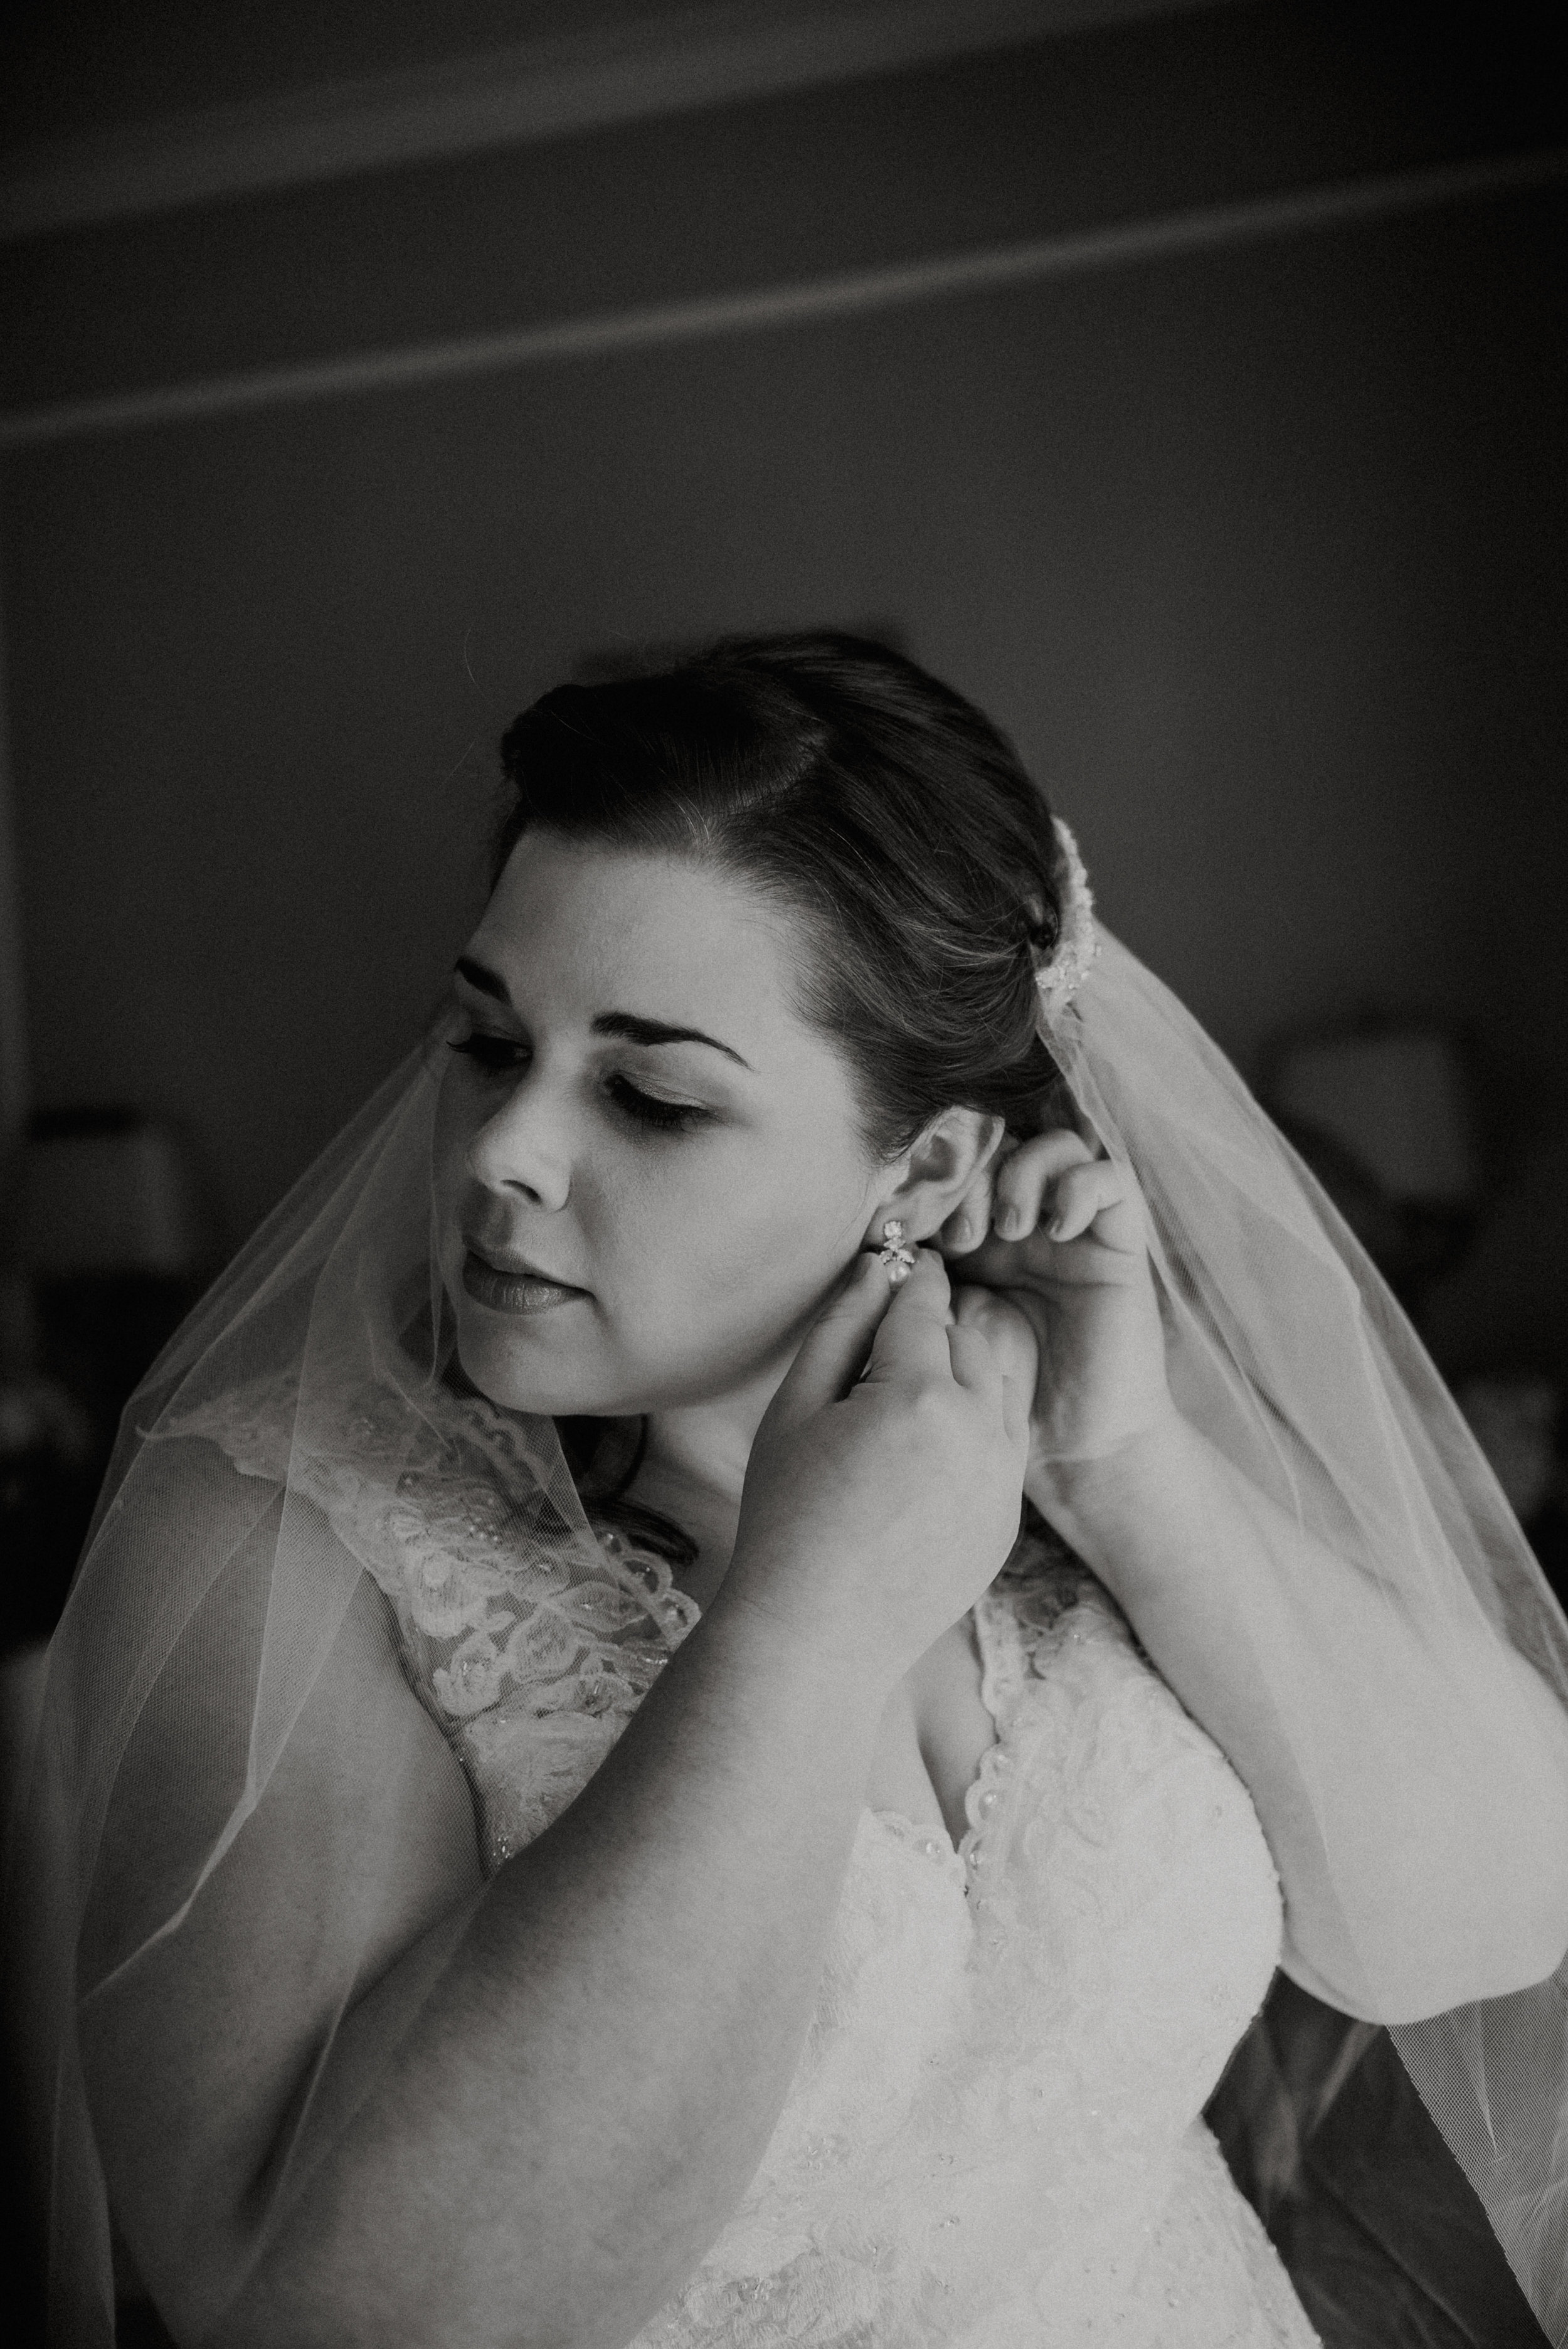 WonderlyCreative_Wedding_5.12.18_Megan&Swapnil_-386a57a17a8.jpg